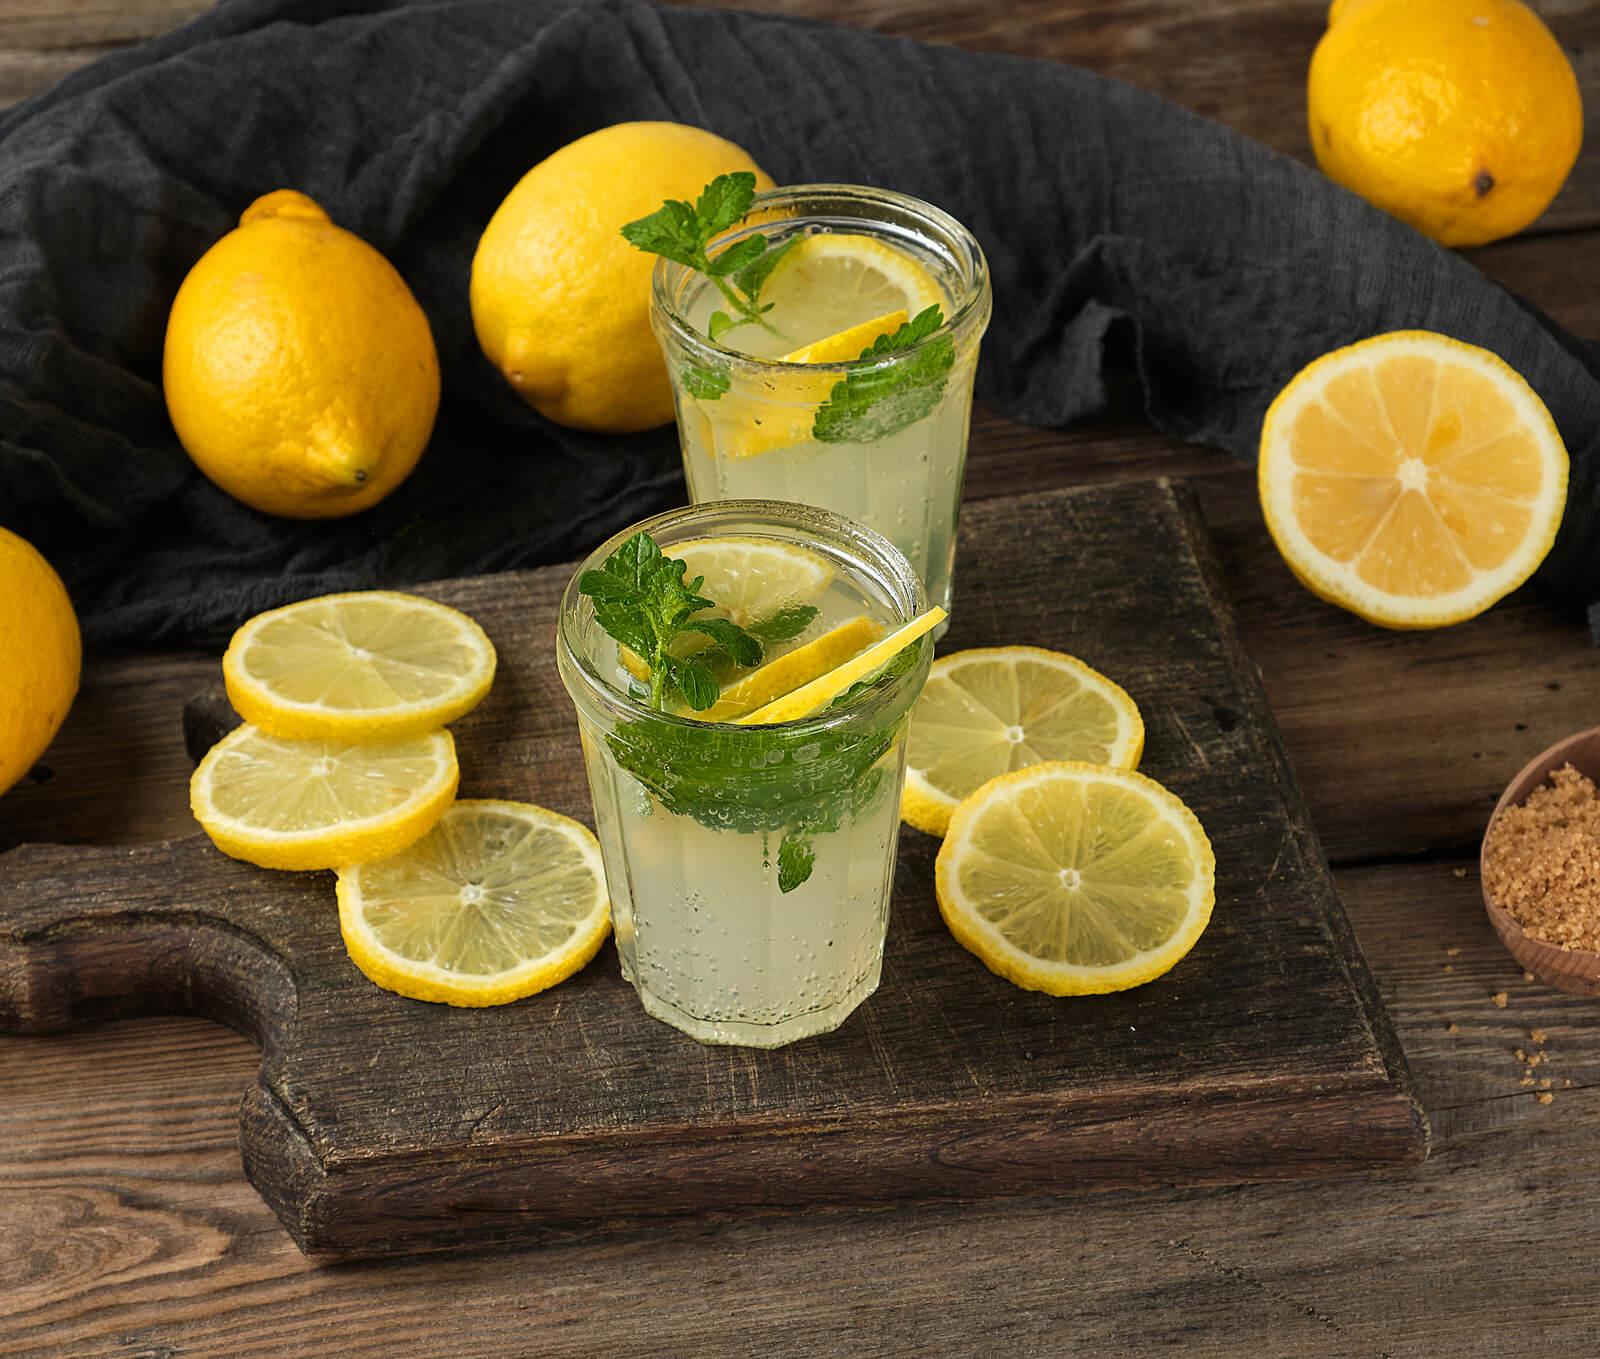 limonada-cocktail-varatic